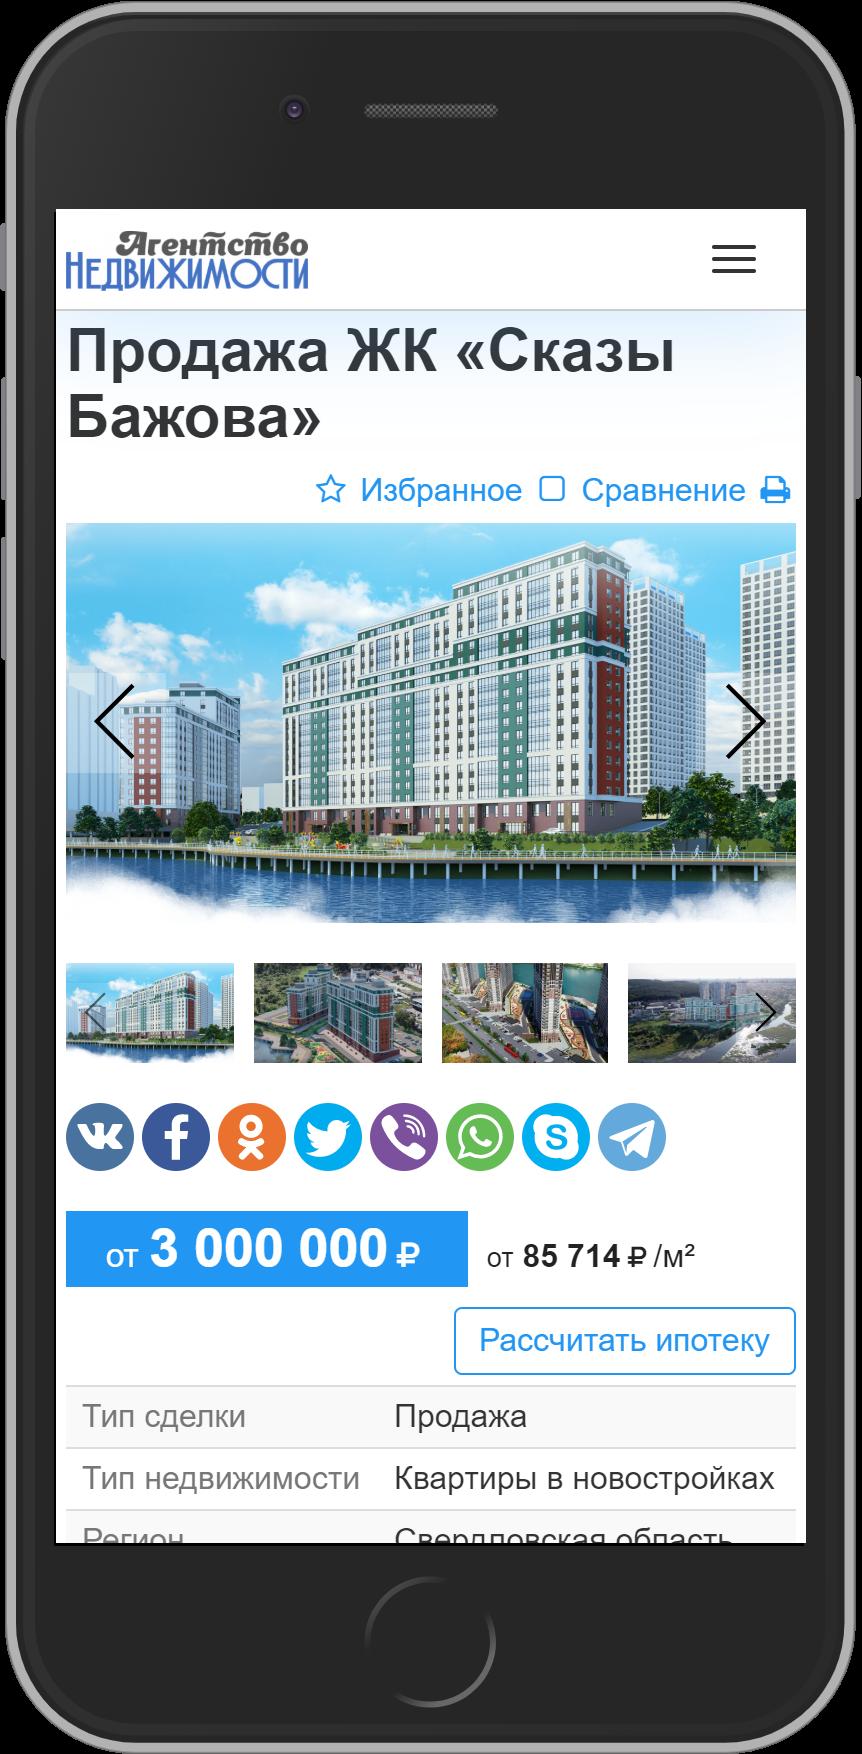 Сайт недвижимости JokerCRM на iPhone 8